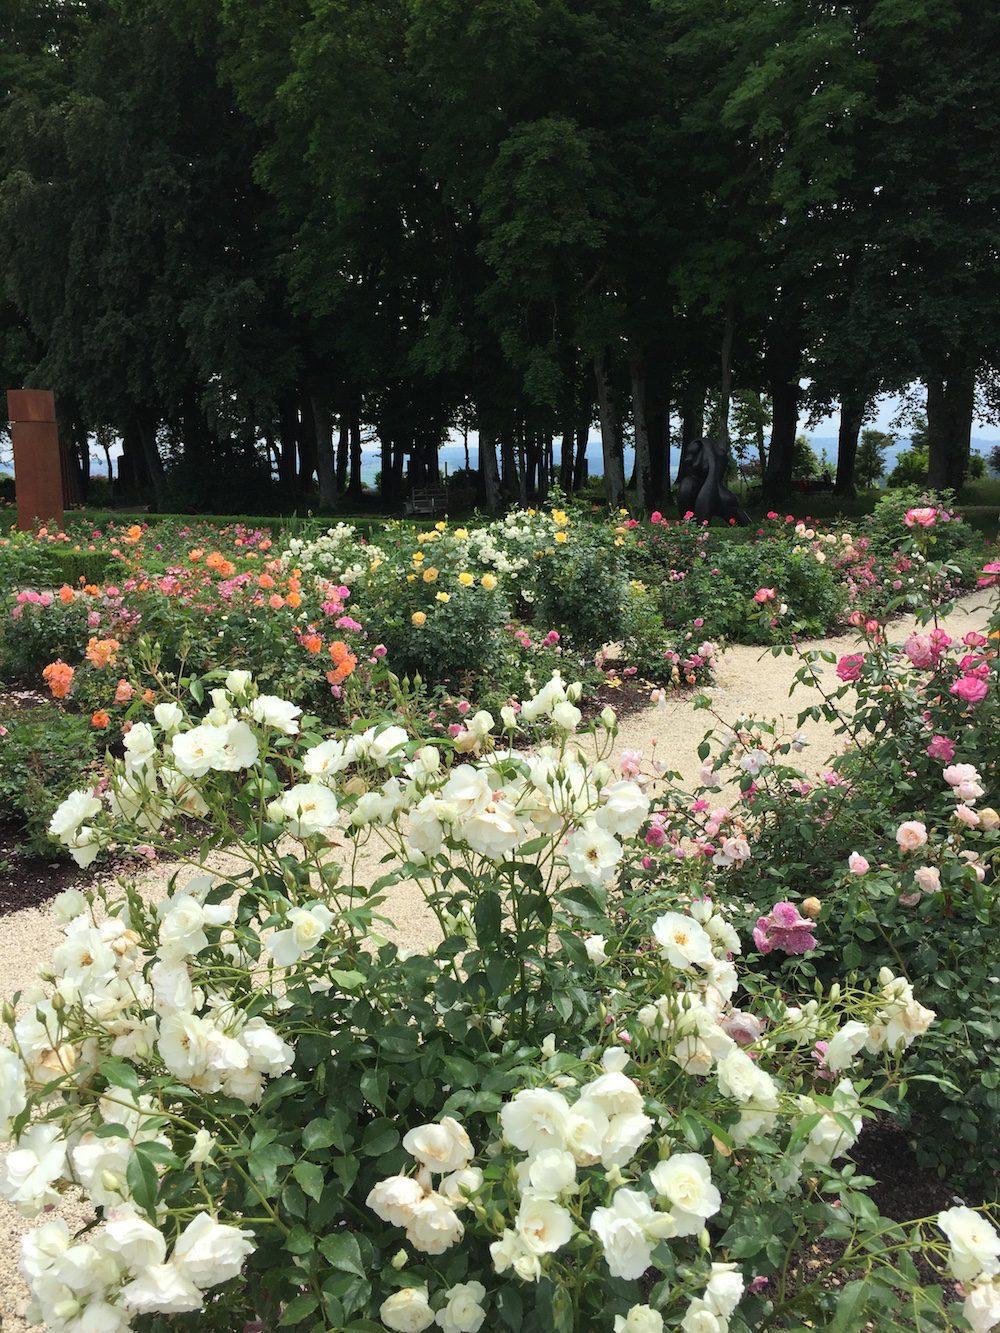 Allée des rosiers fleuries.